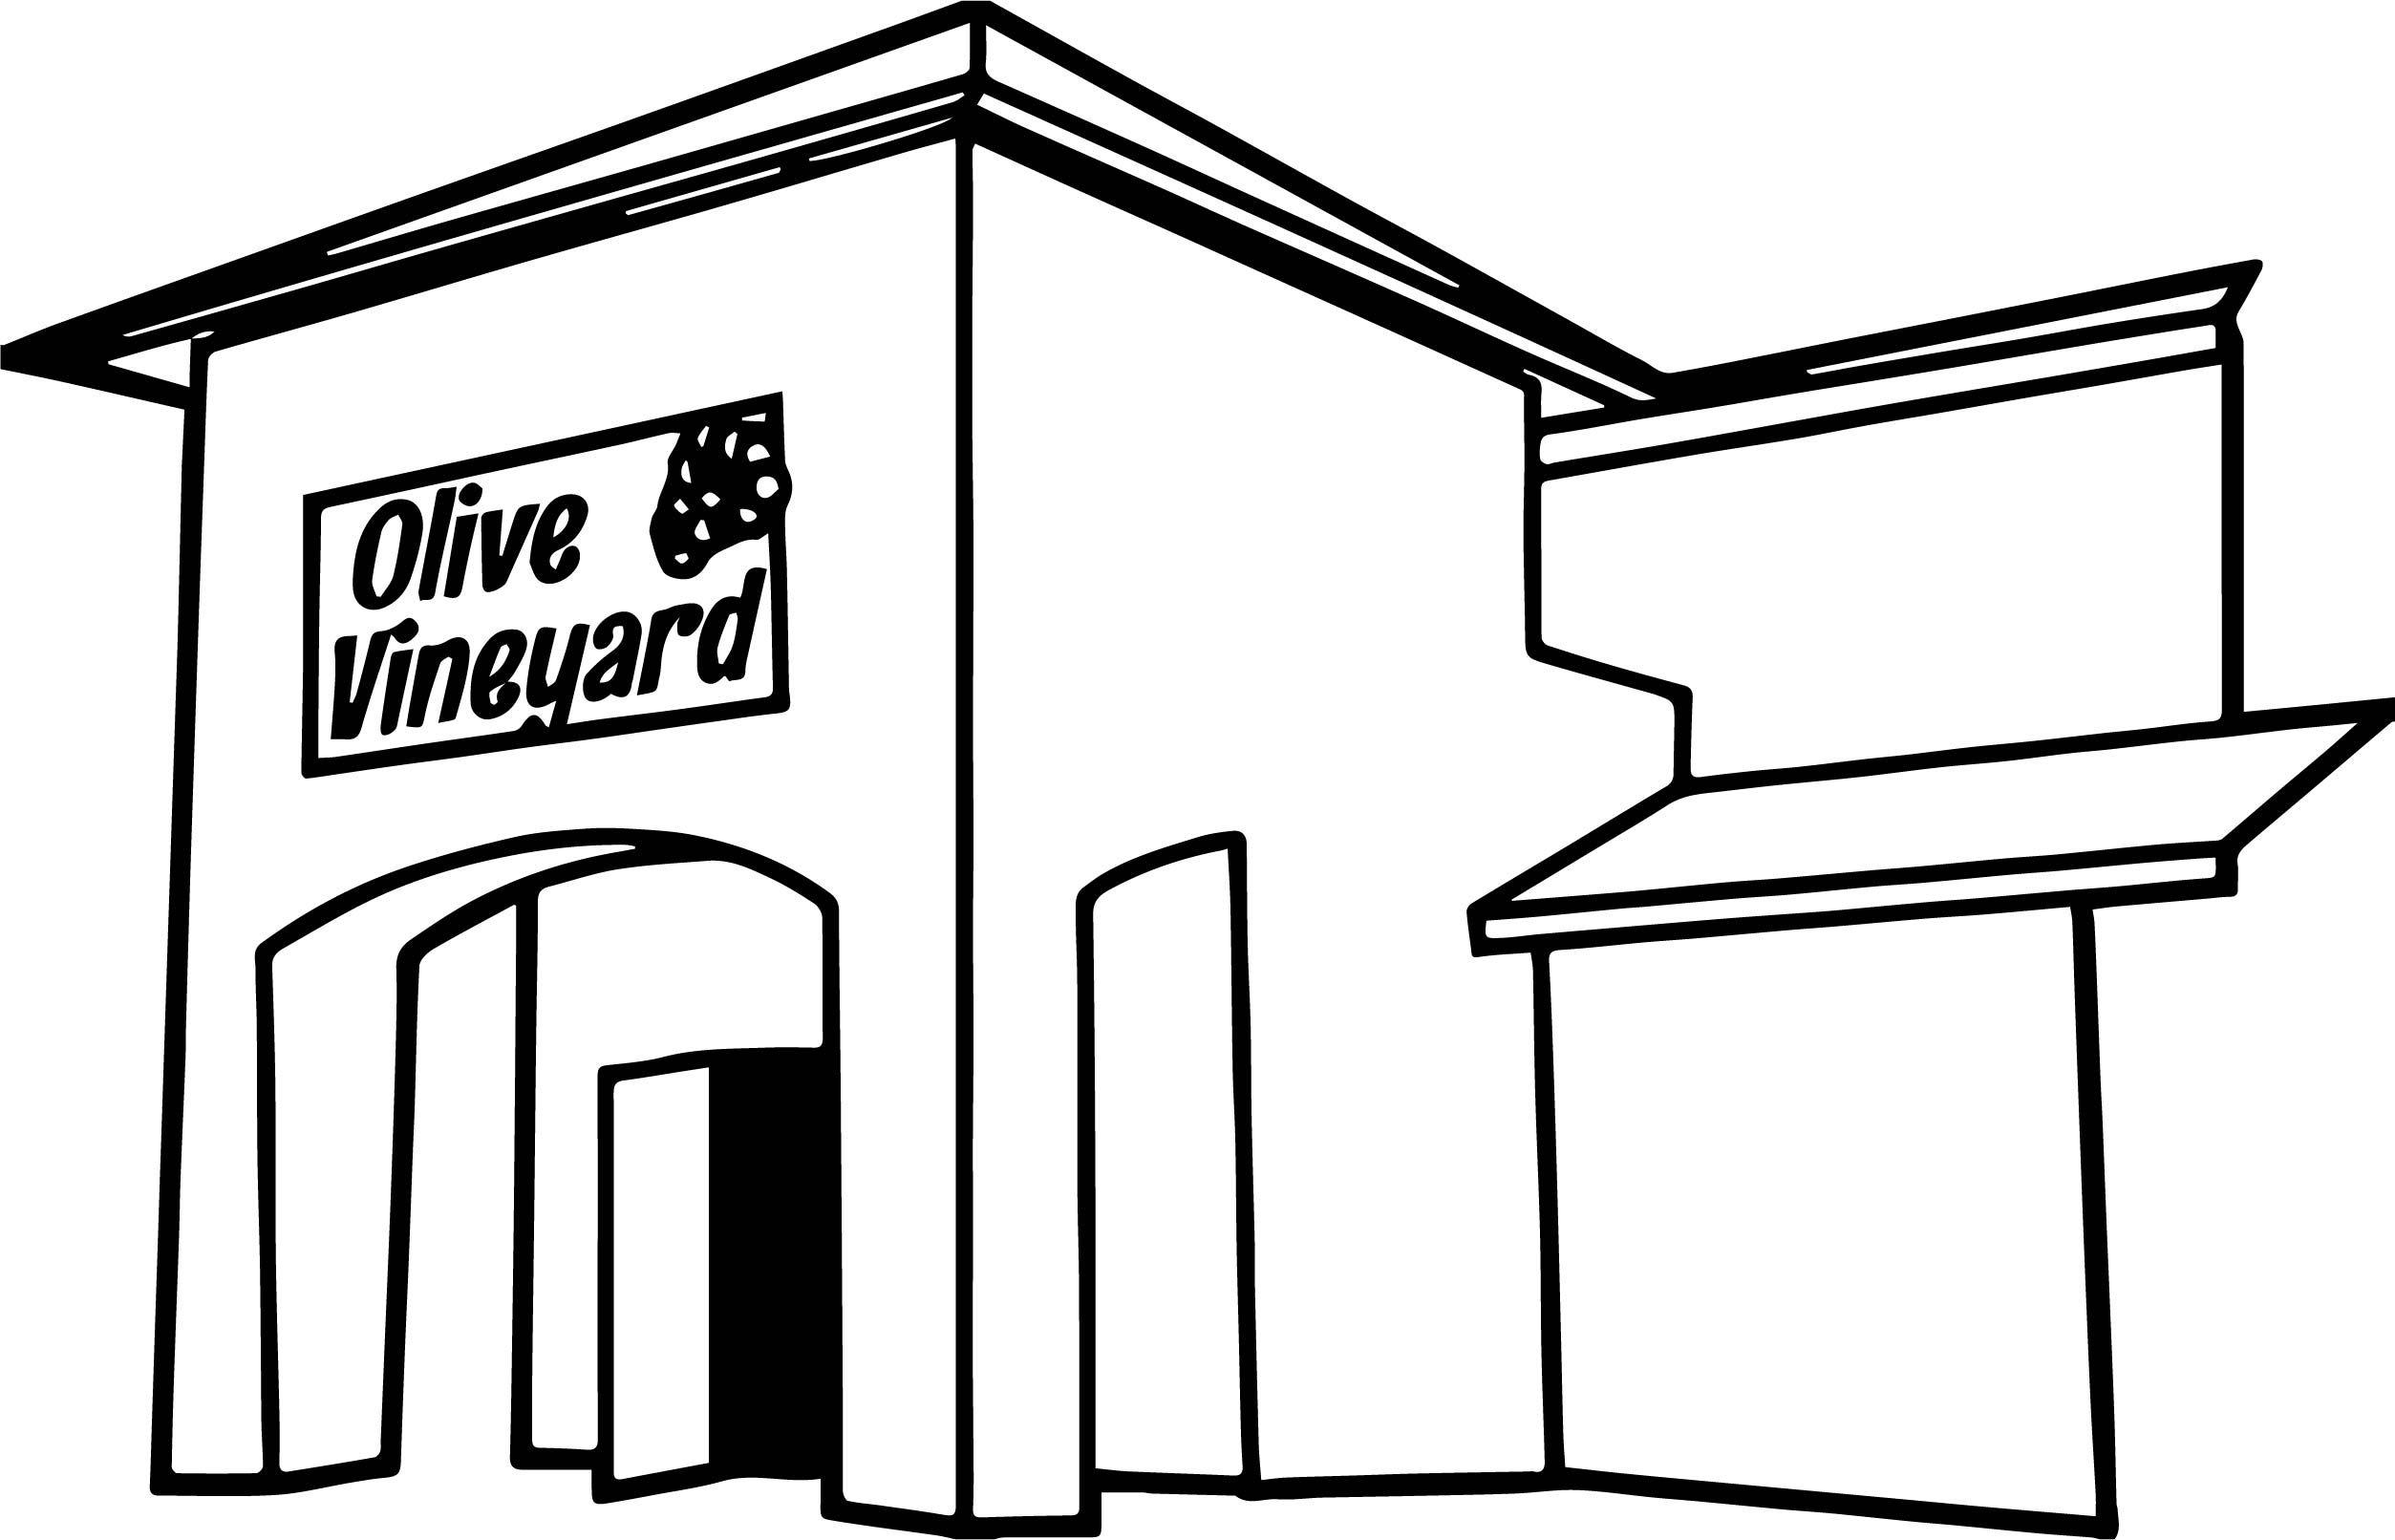 Nice Olive Vineyard Building Front Of Restaurant Coloring Page Coloring Pages Building Front Coloring Sheets For Kids